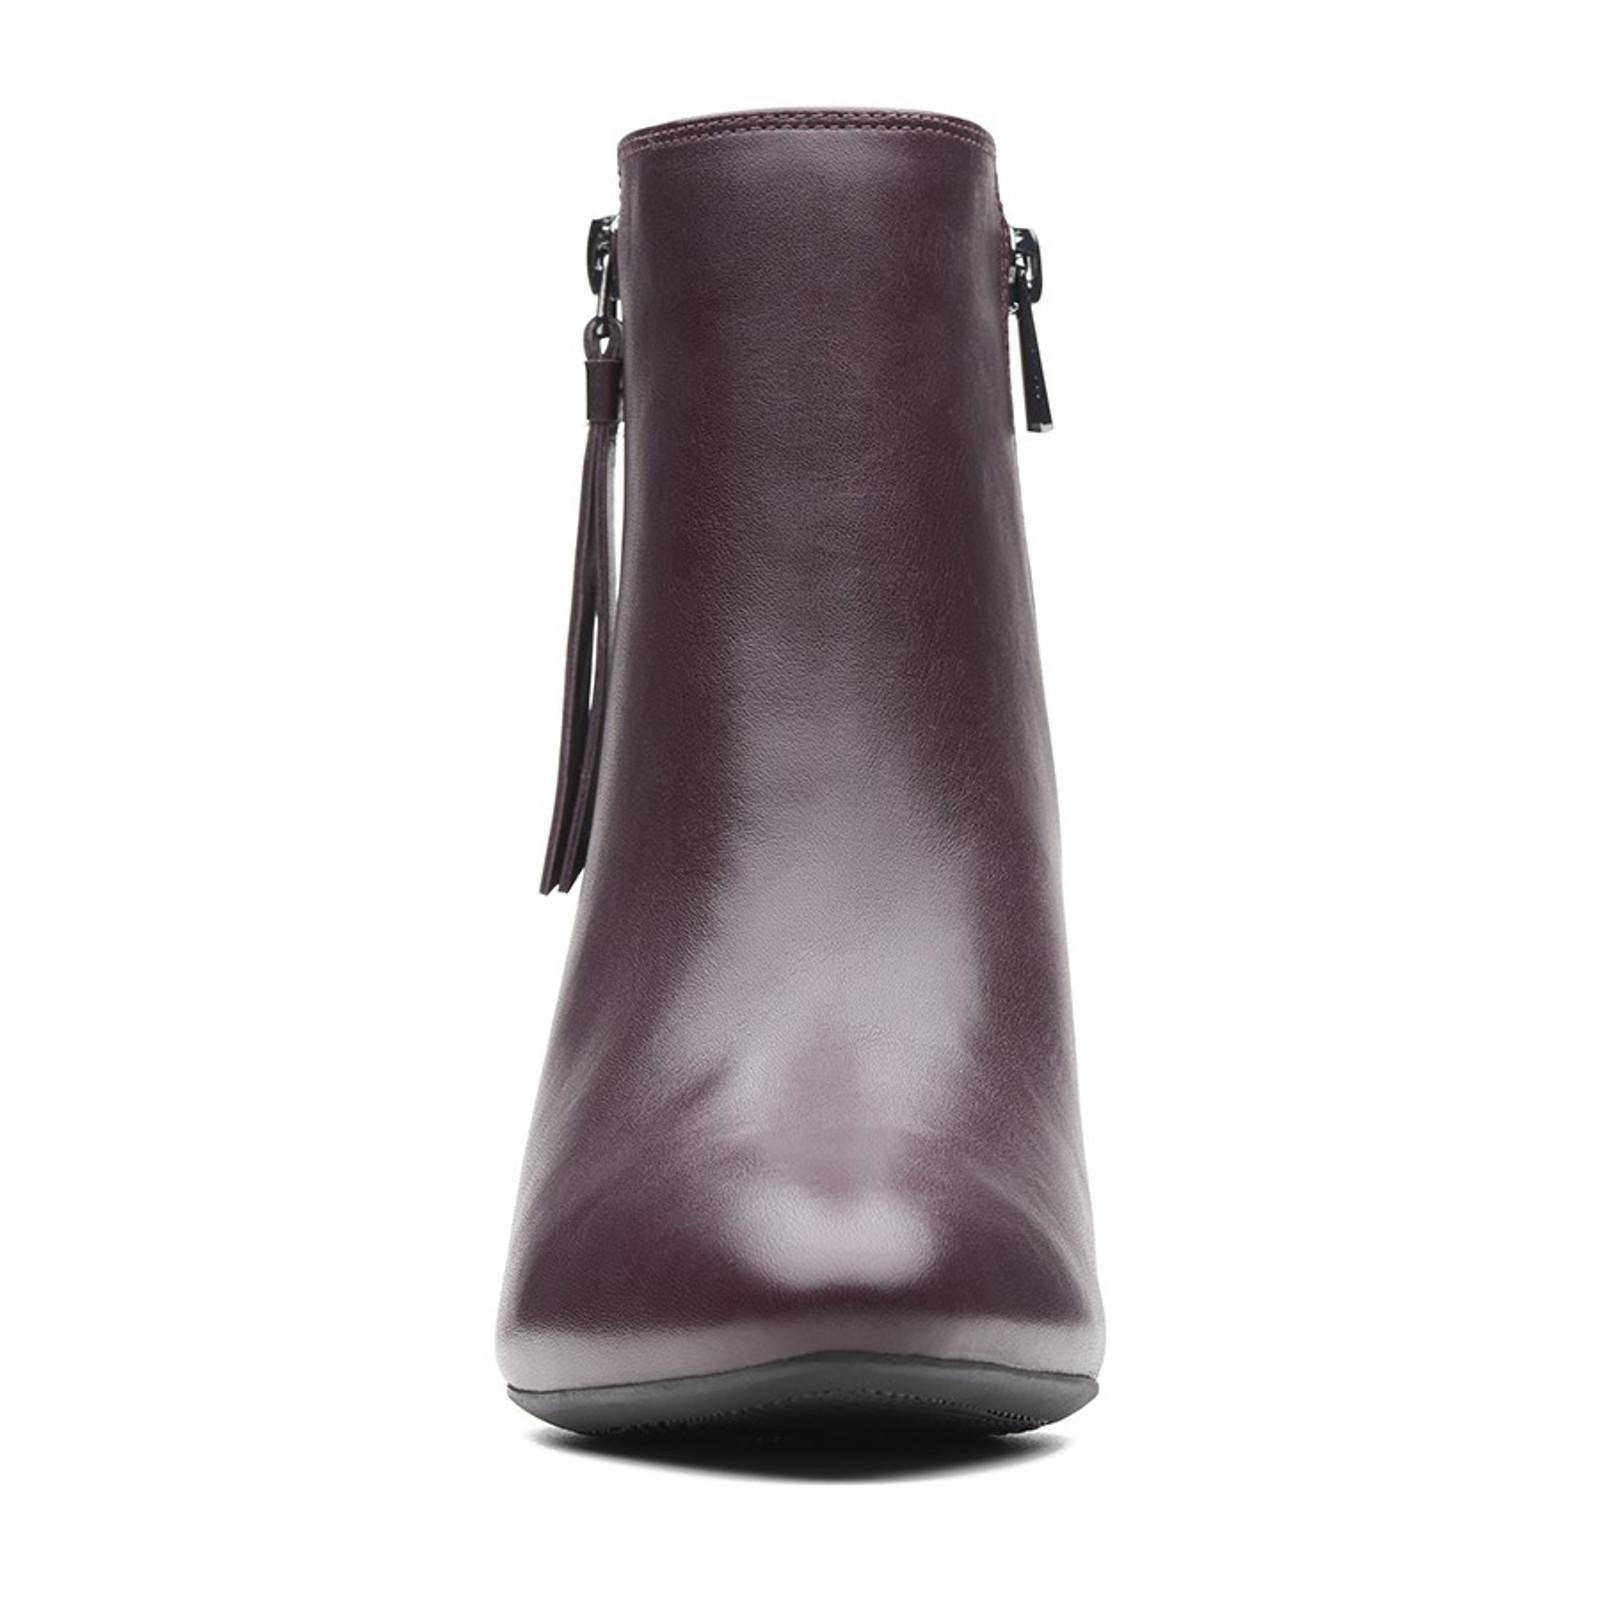 Clarks Womens CALLA BLOSSOM Aubergine Leather